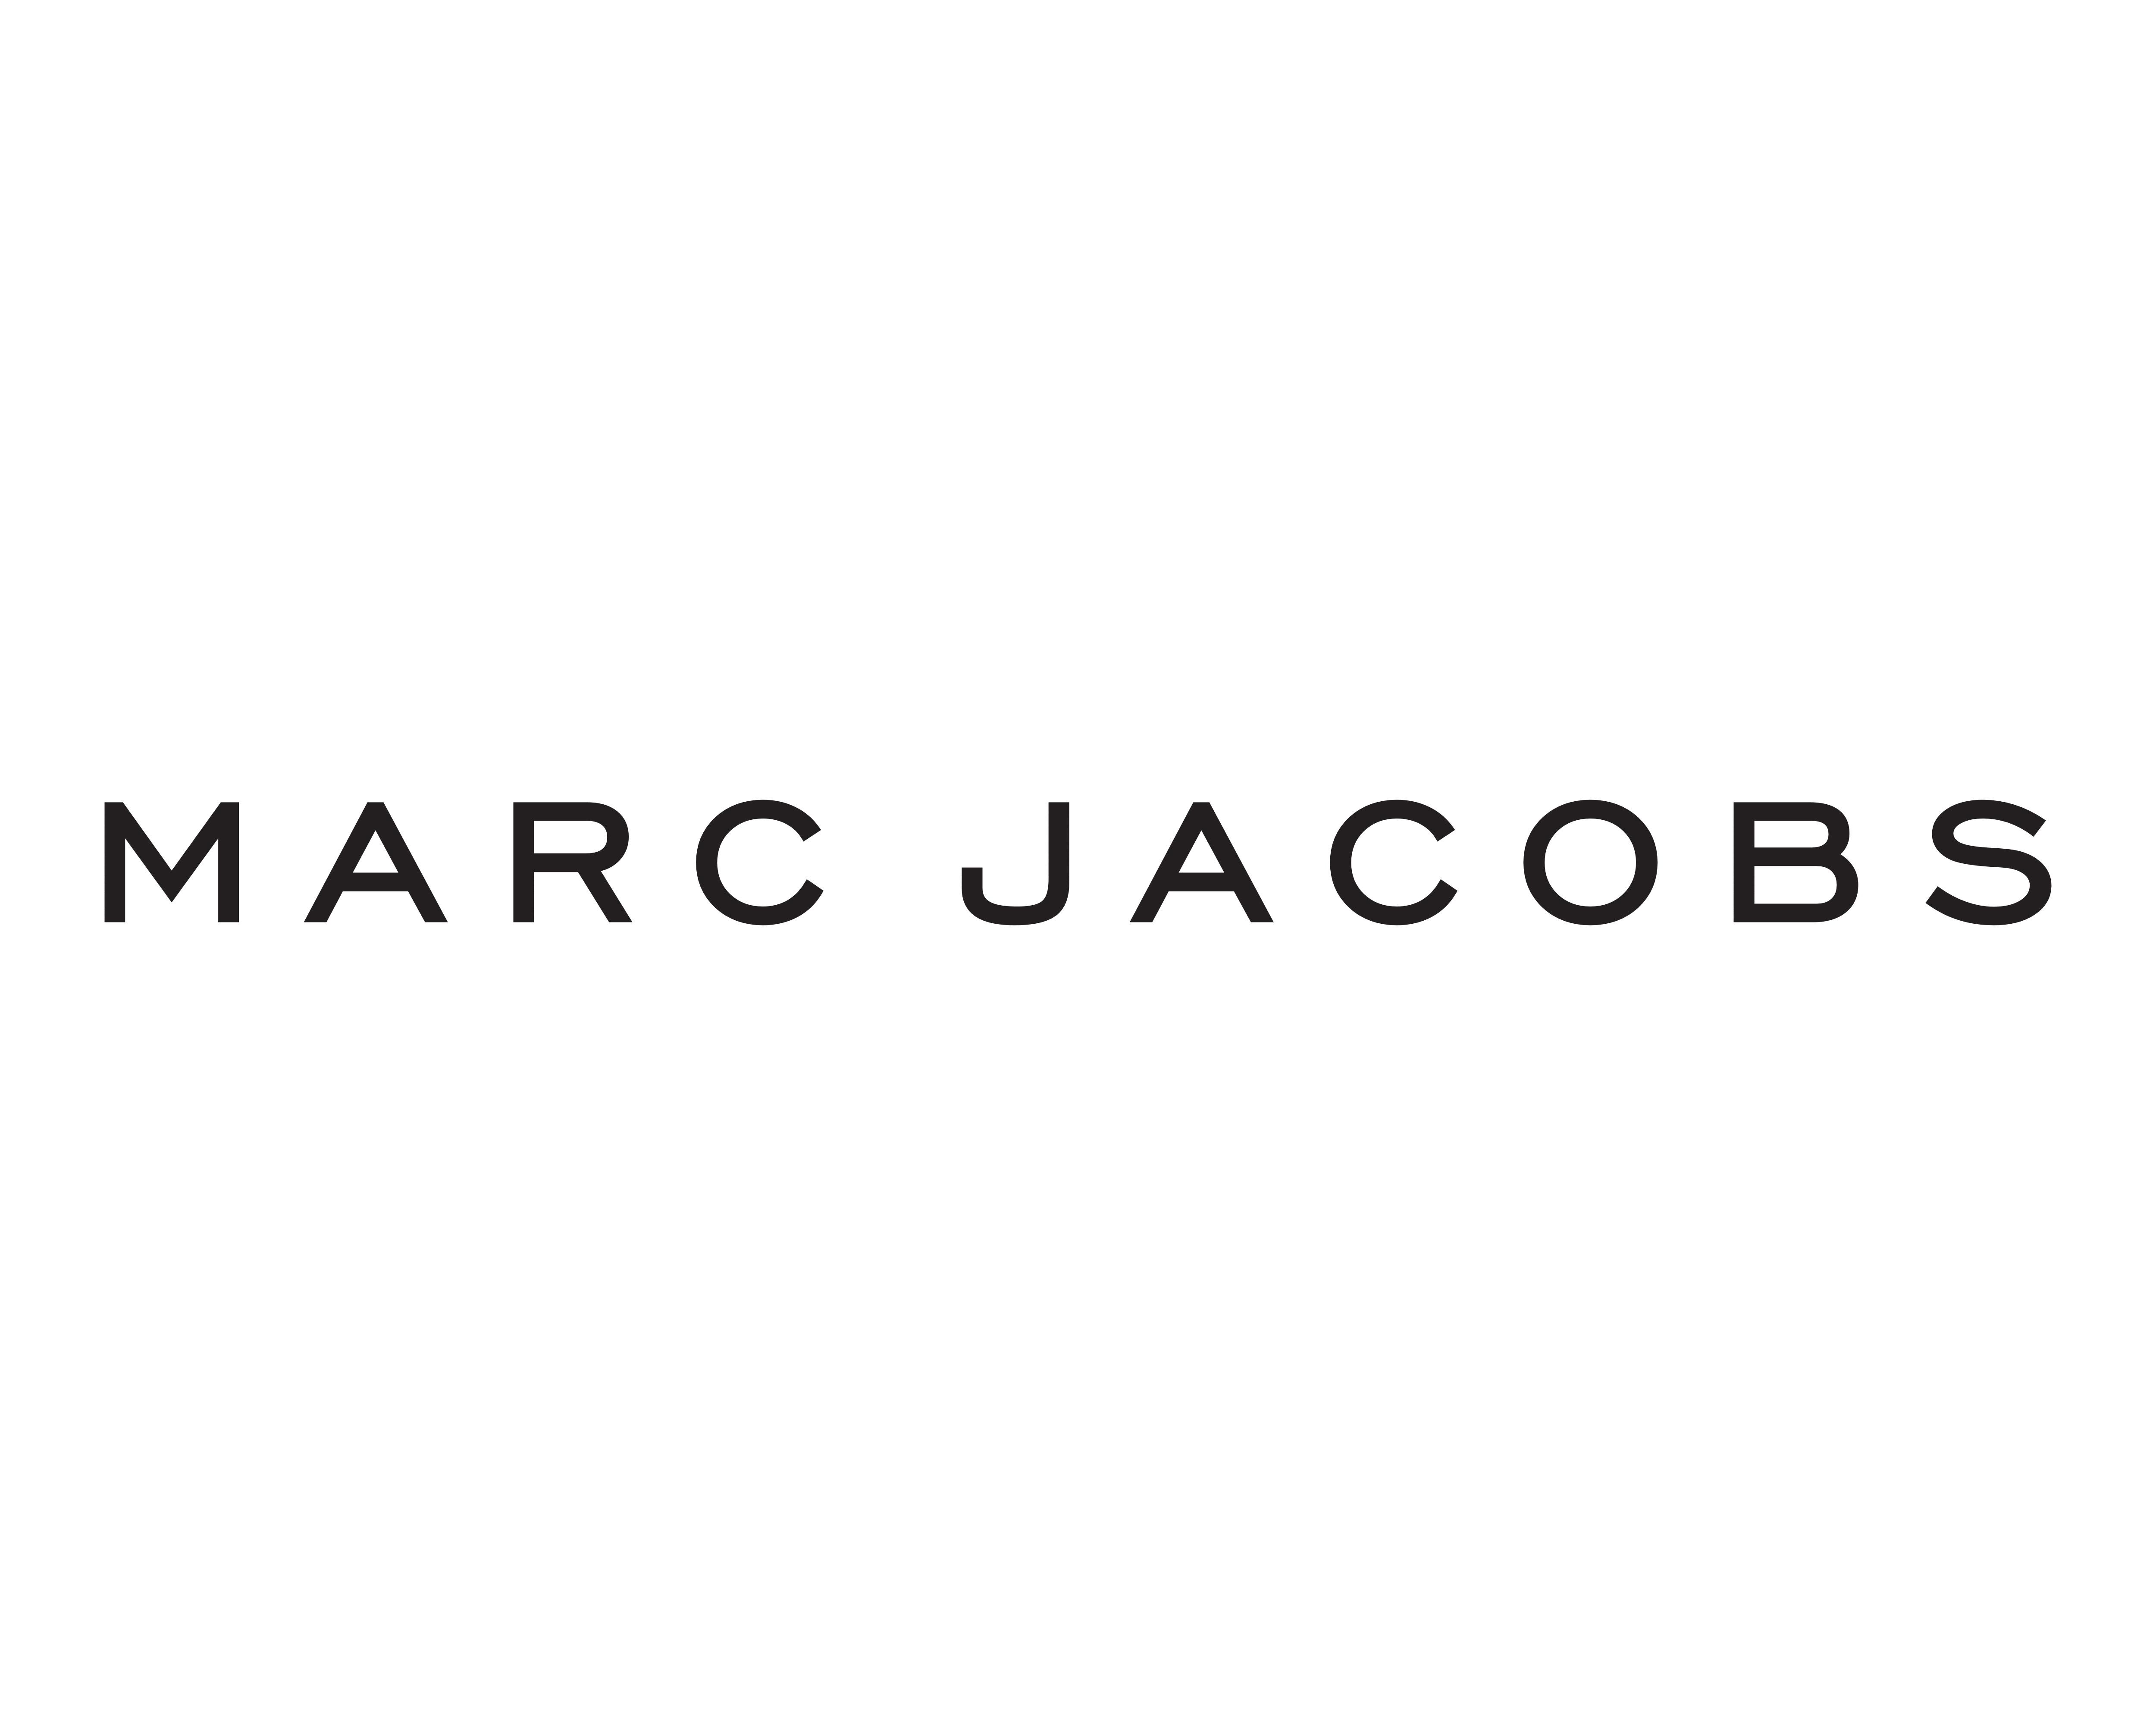 Marc_Jacobs_logo_wordmark.jpg